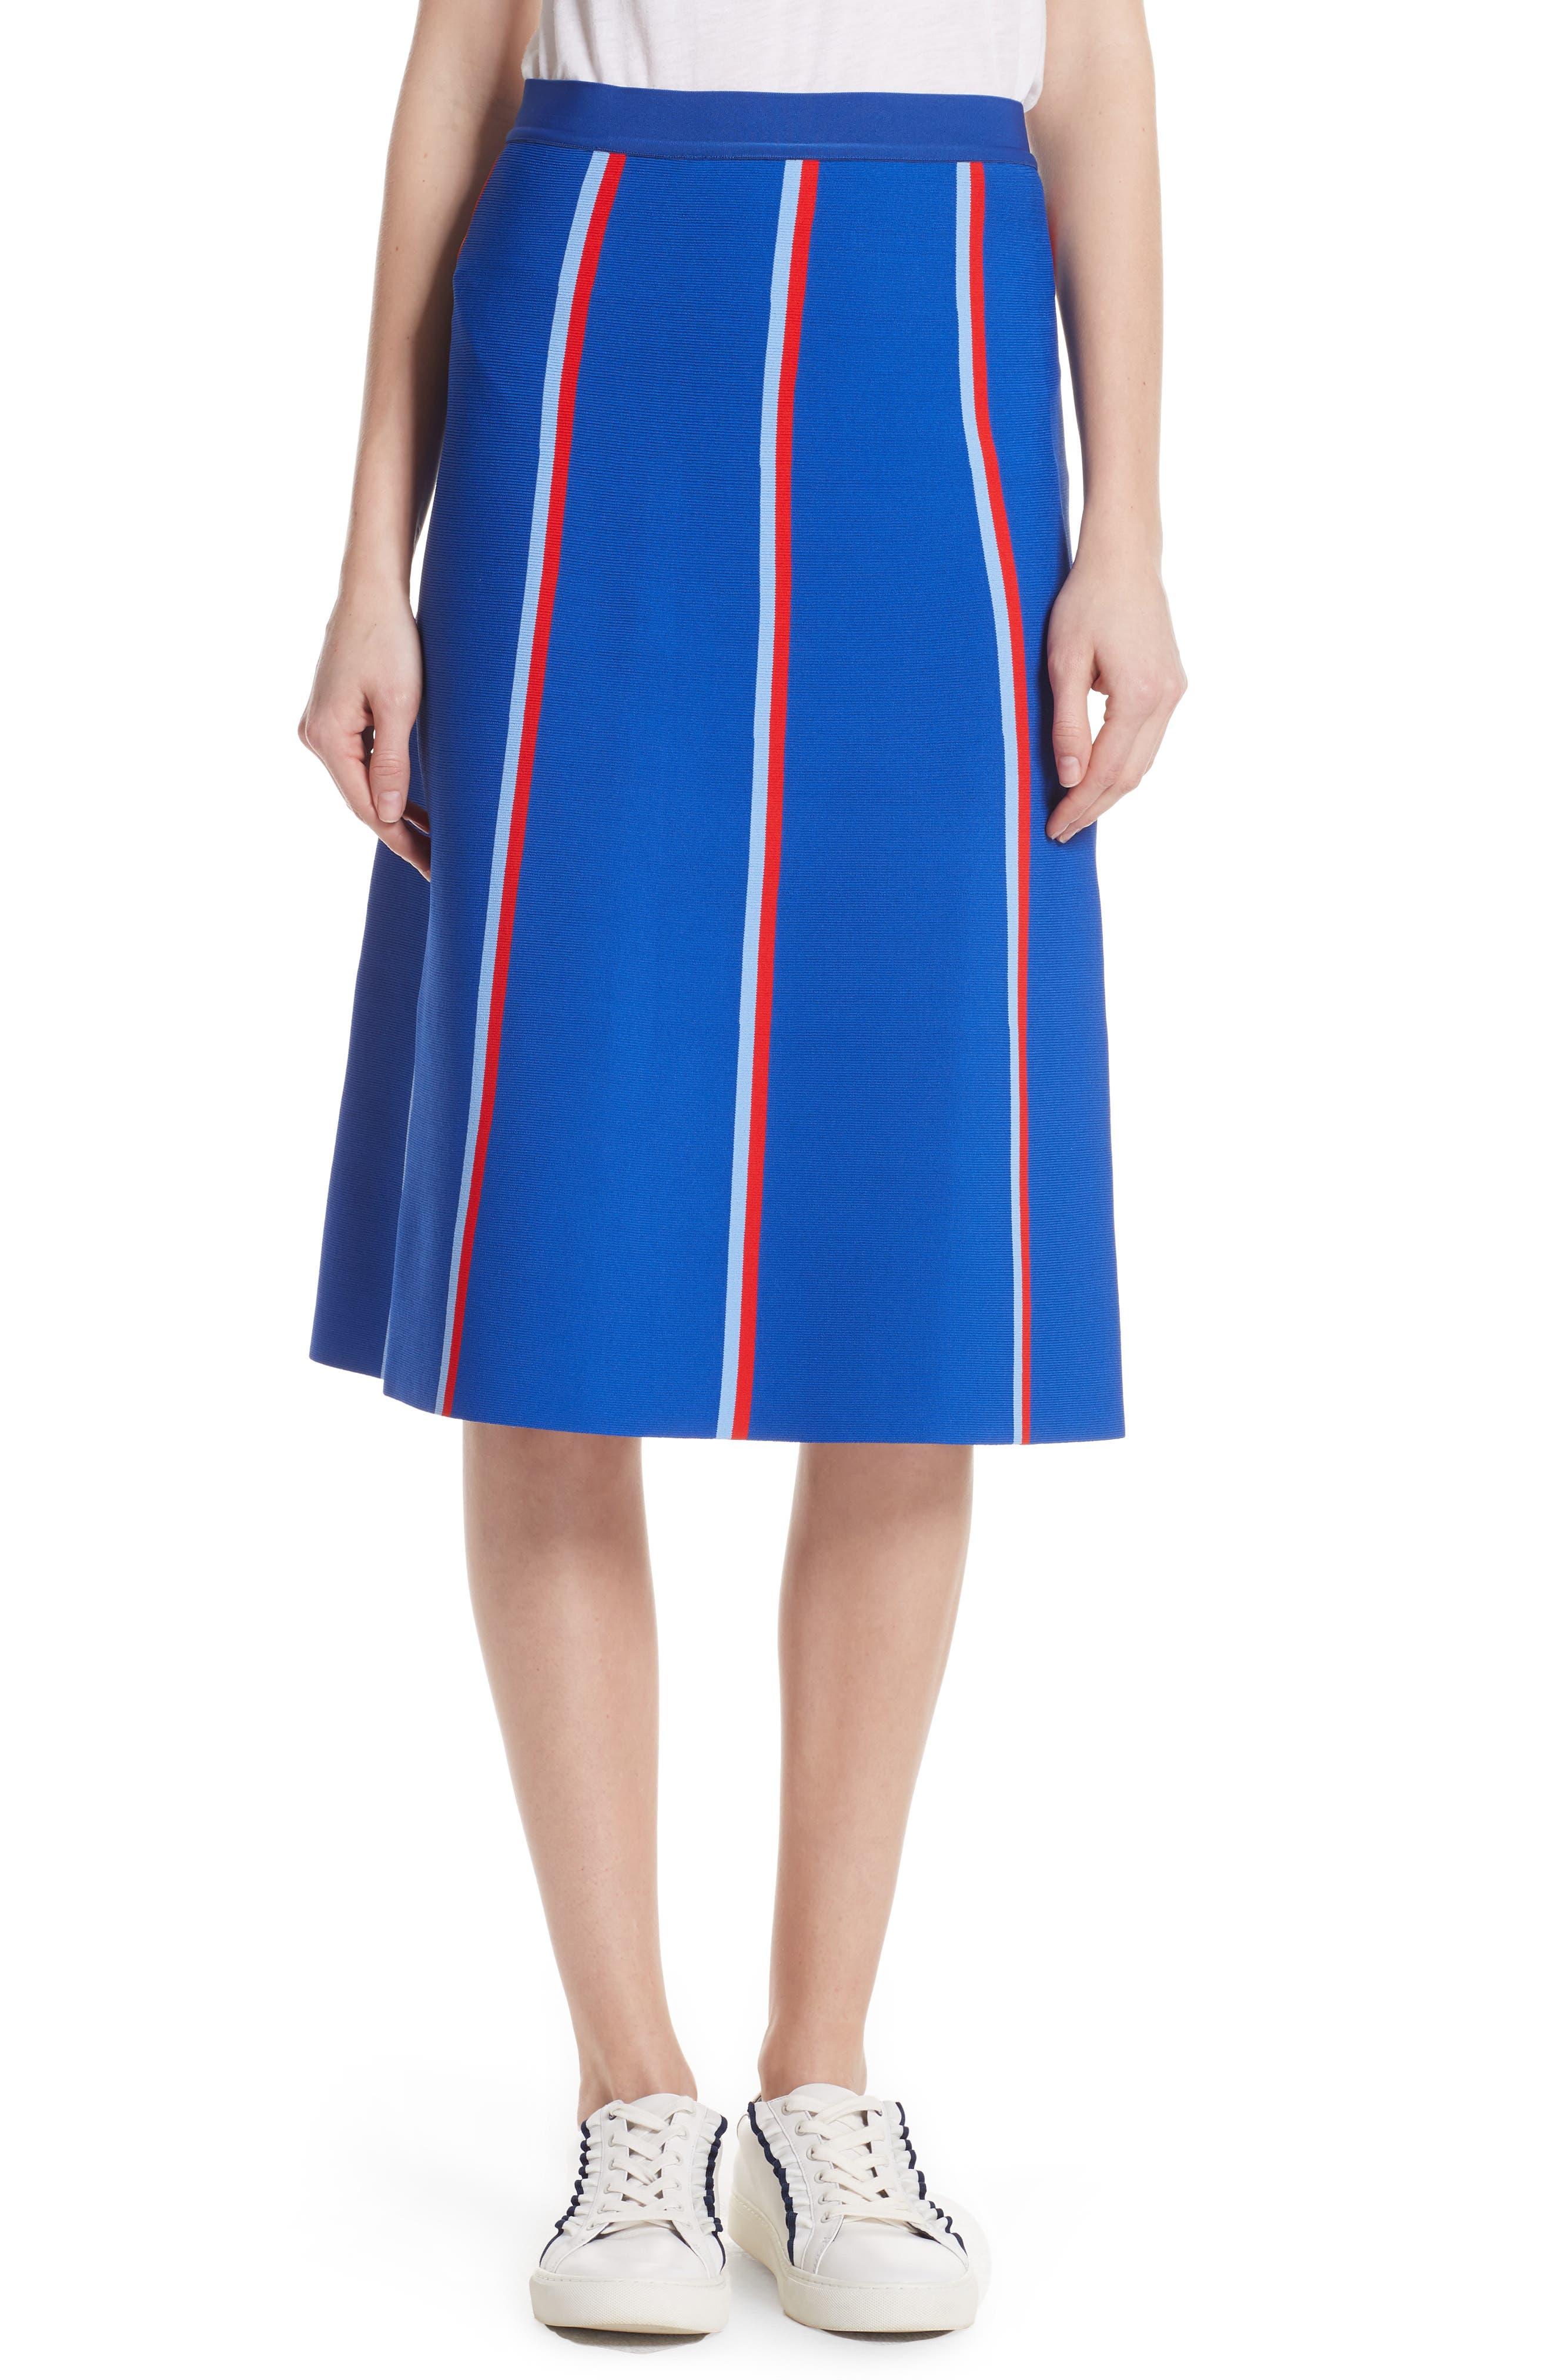 Twin Stripe Tech Knit Skirt,                             Main thumbnail 1, color,                             SLALOM BLUE